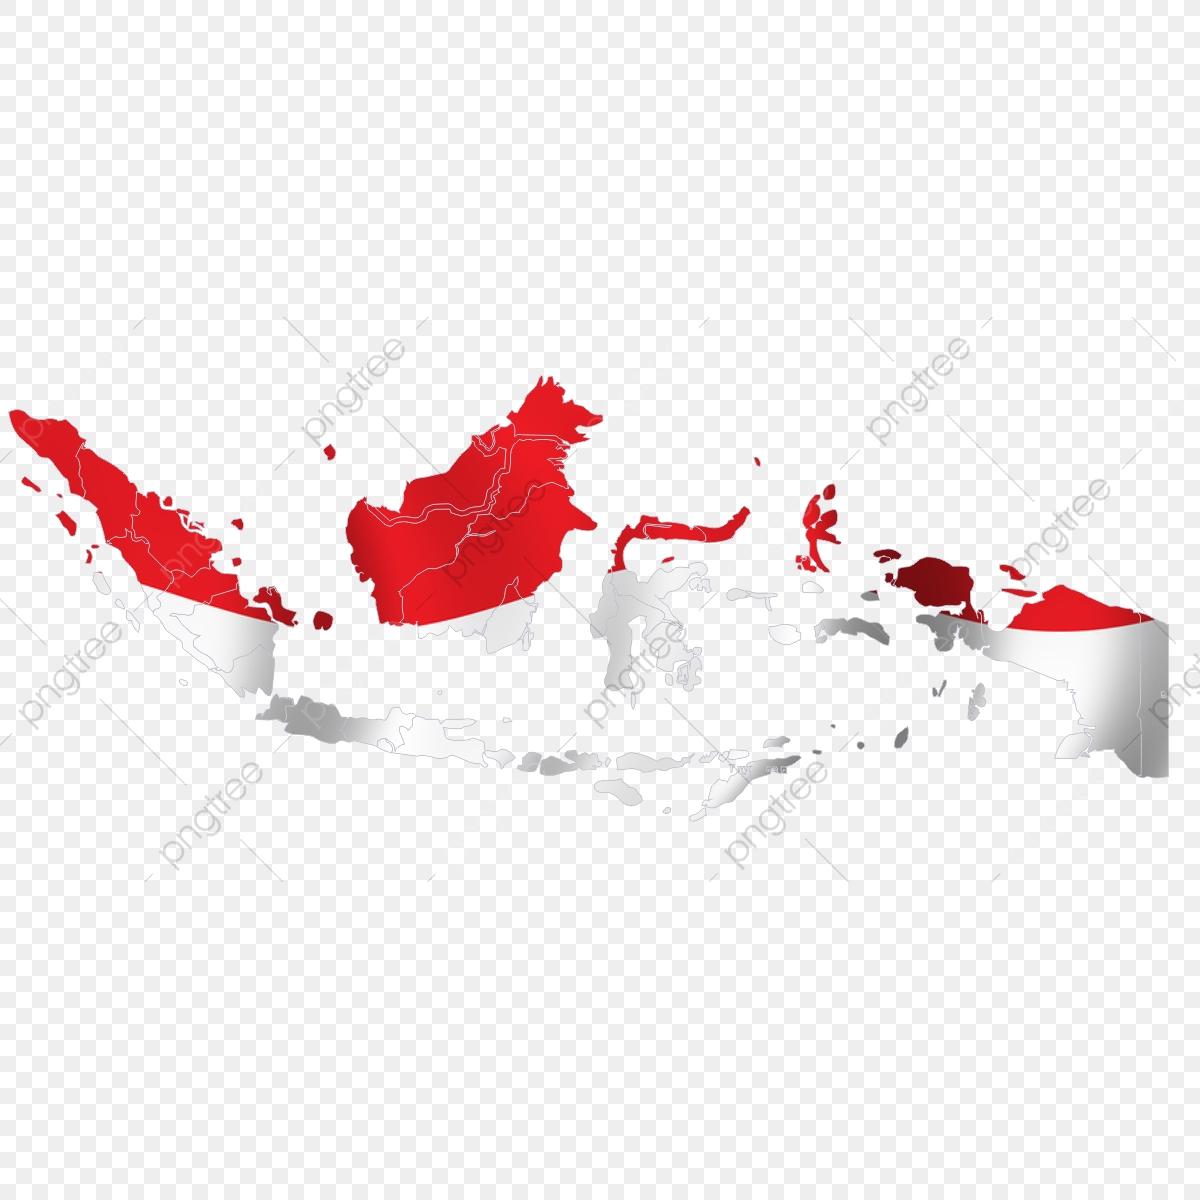 Peta Merah Putih, Alamat, Kawasan, Indah PNG dan Vektor.